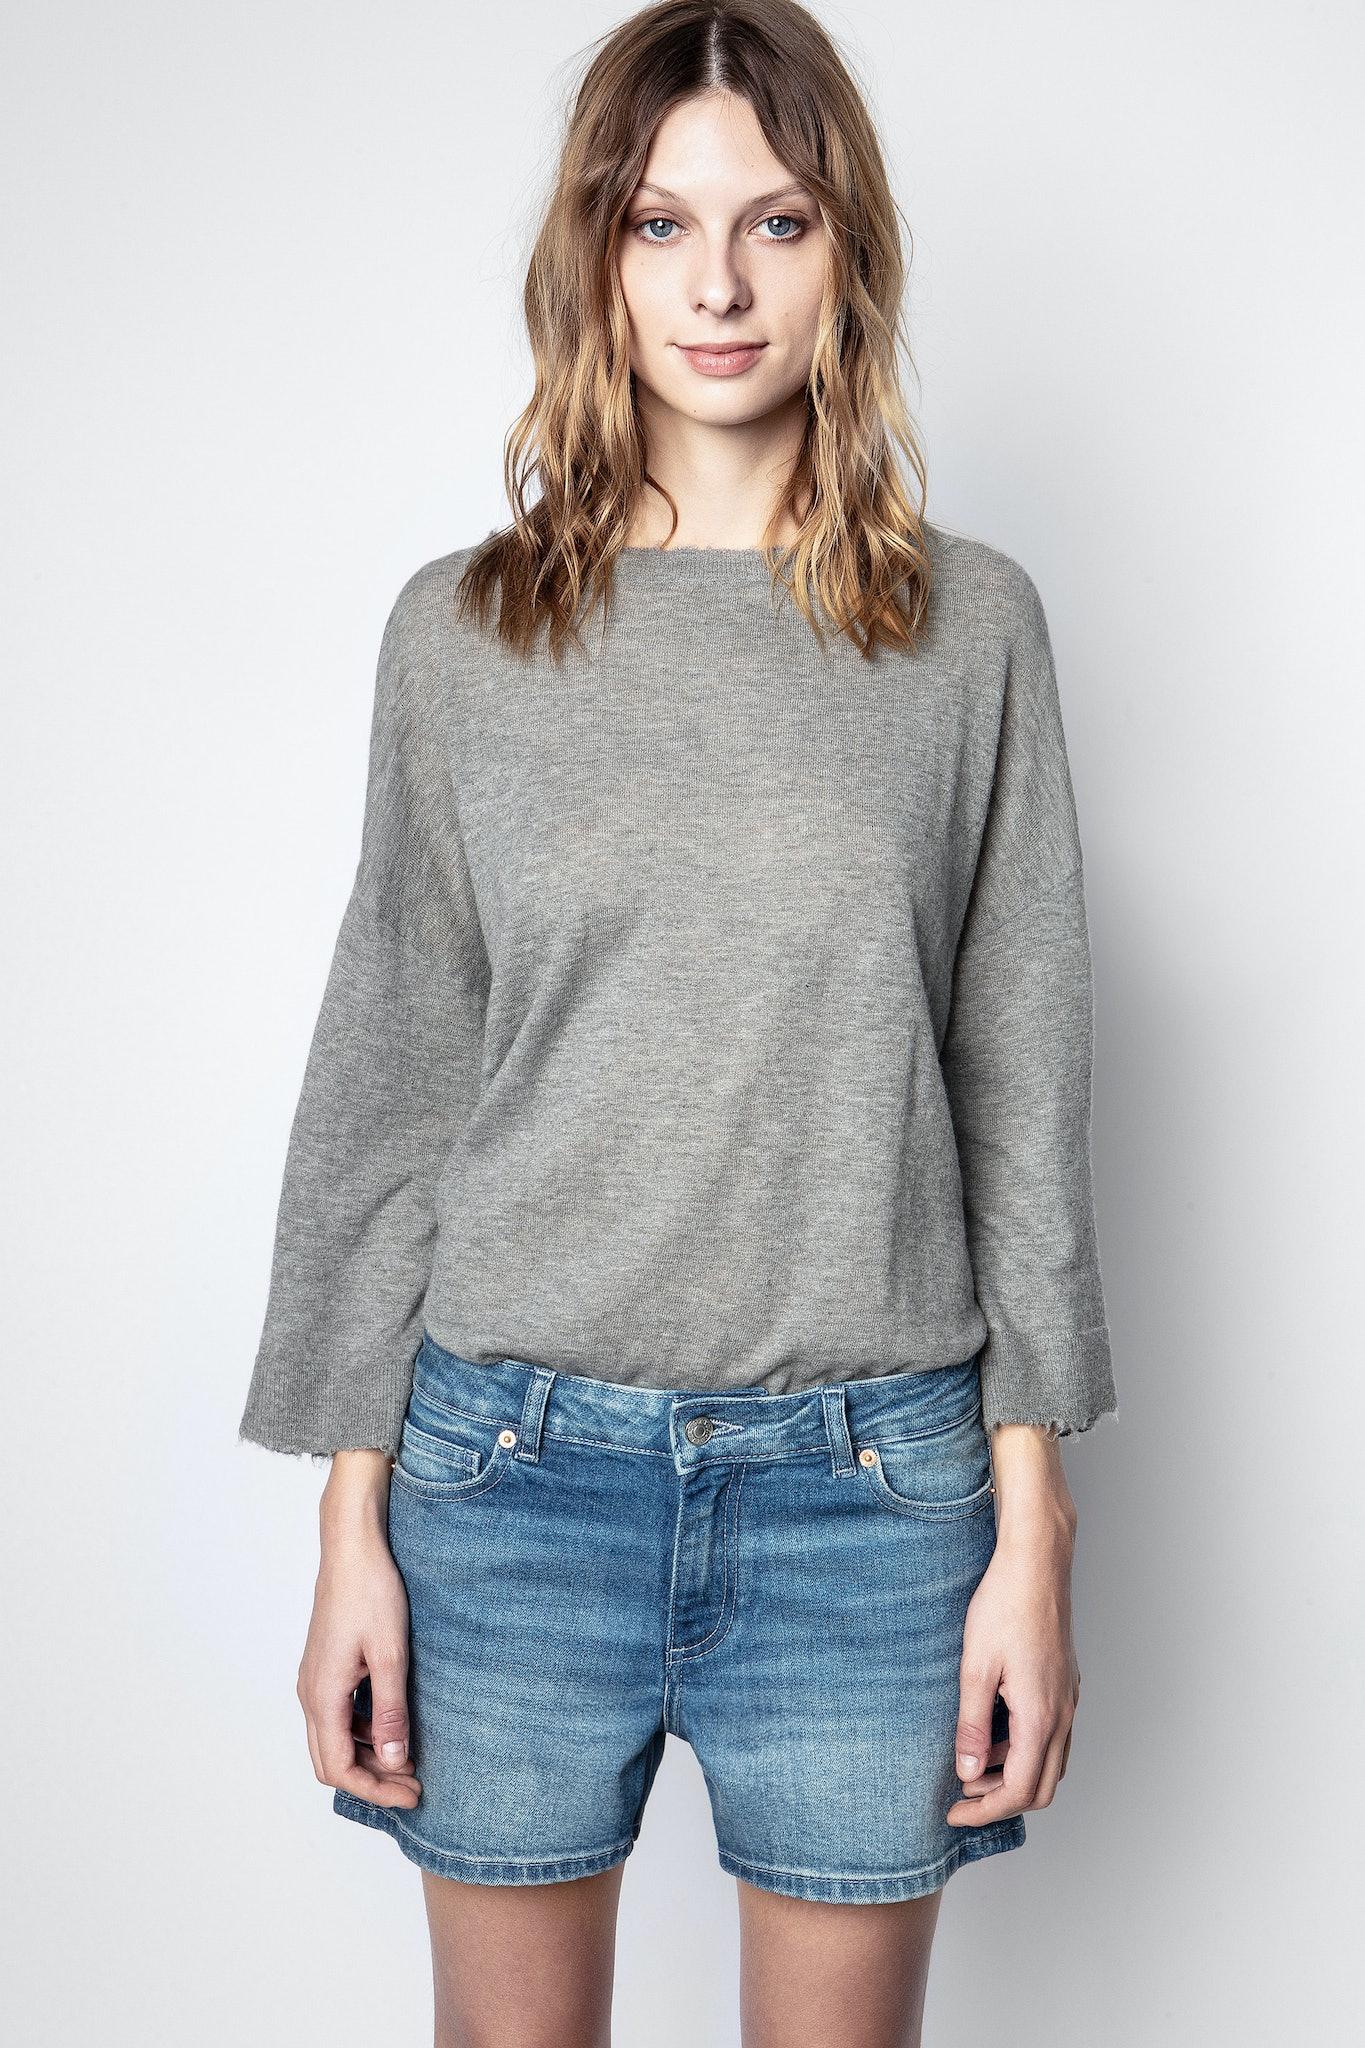 Flint Patch Cachemire Sweater